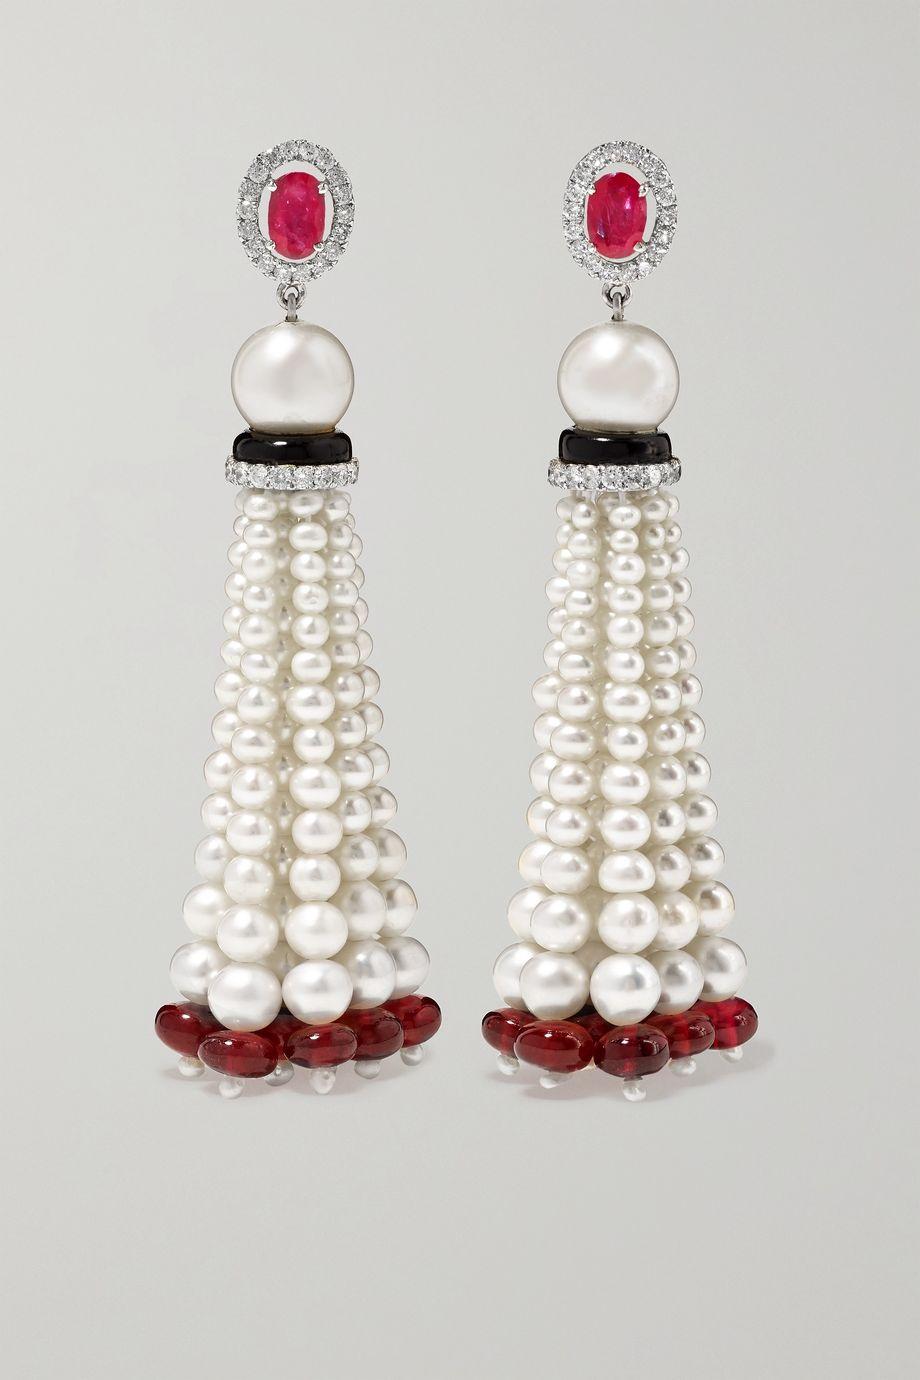 Amrapali 18-karat white gold multi-stone earrings